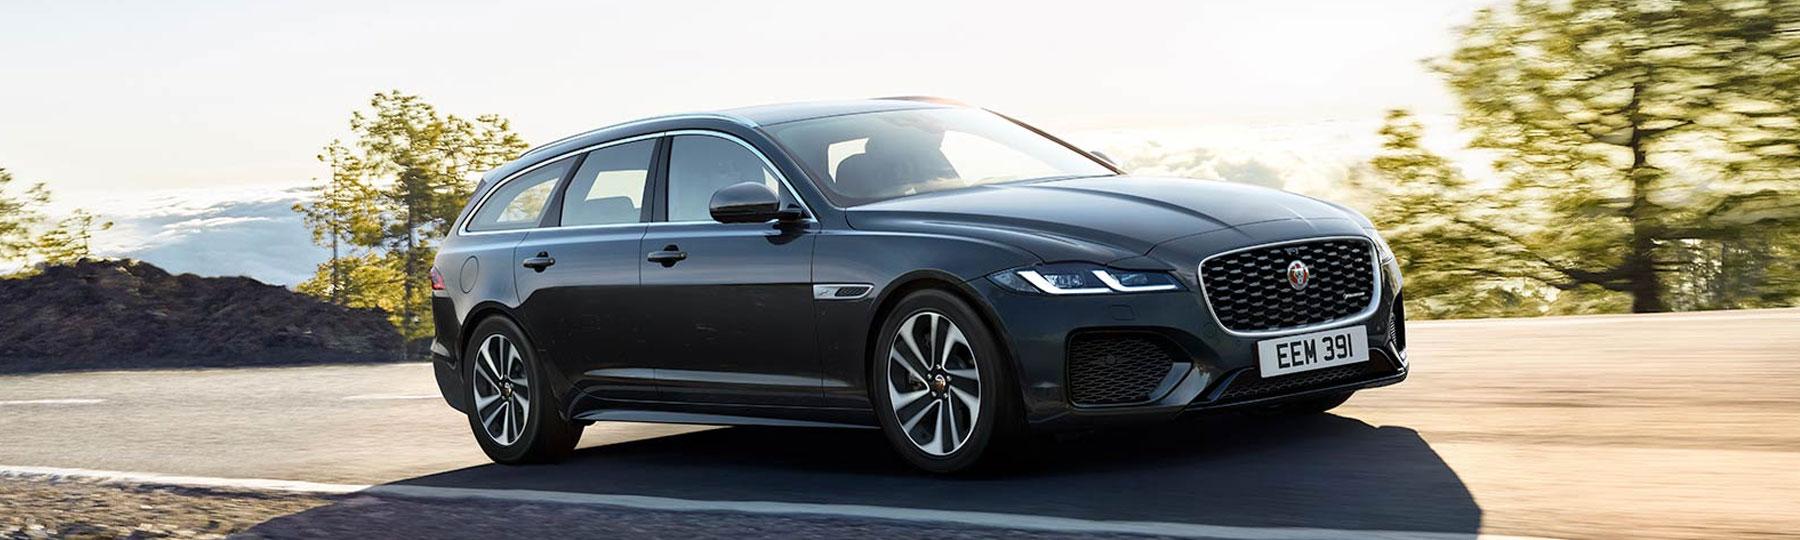 New Jaguar XF Sportbrake New Car Offer